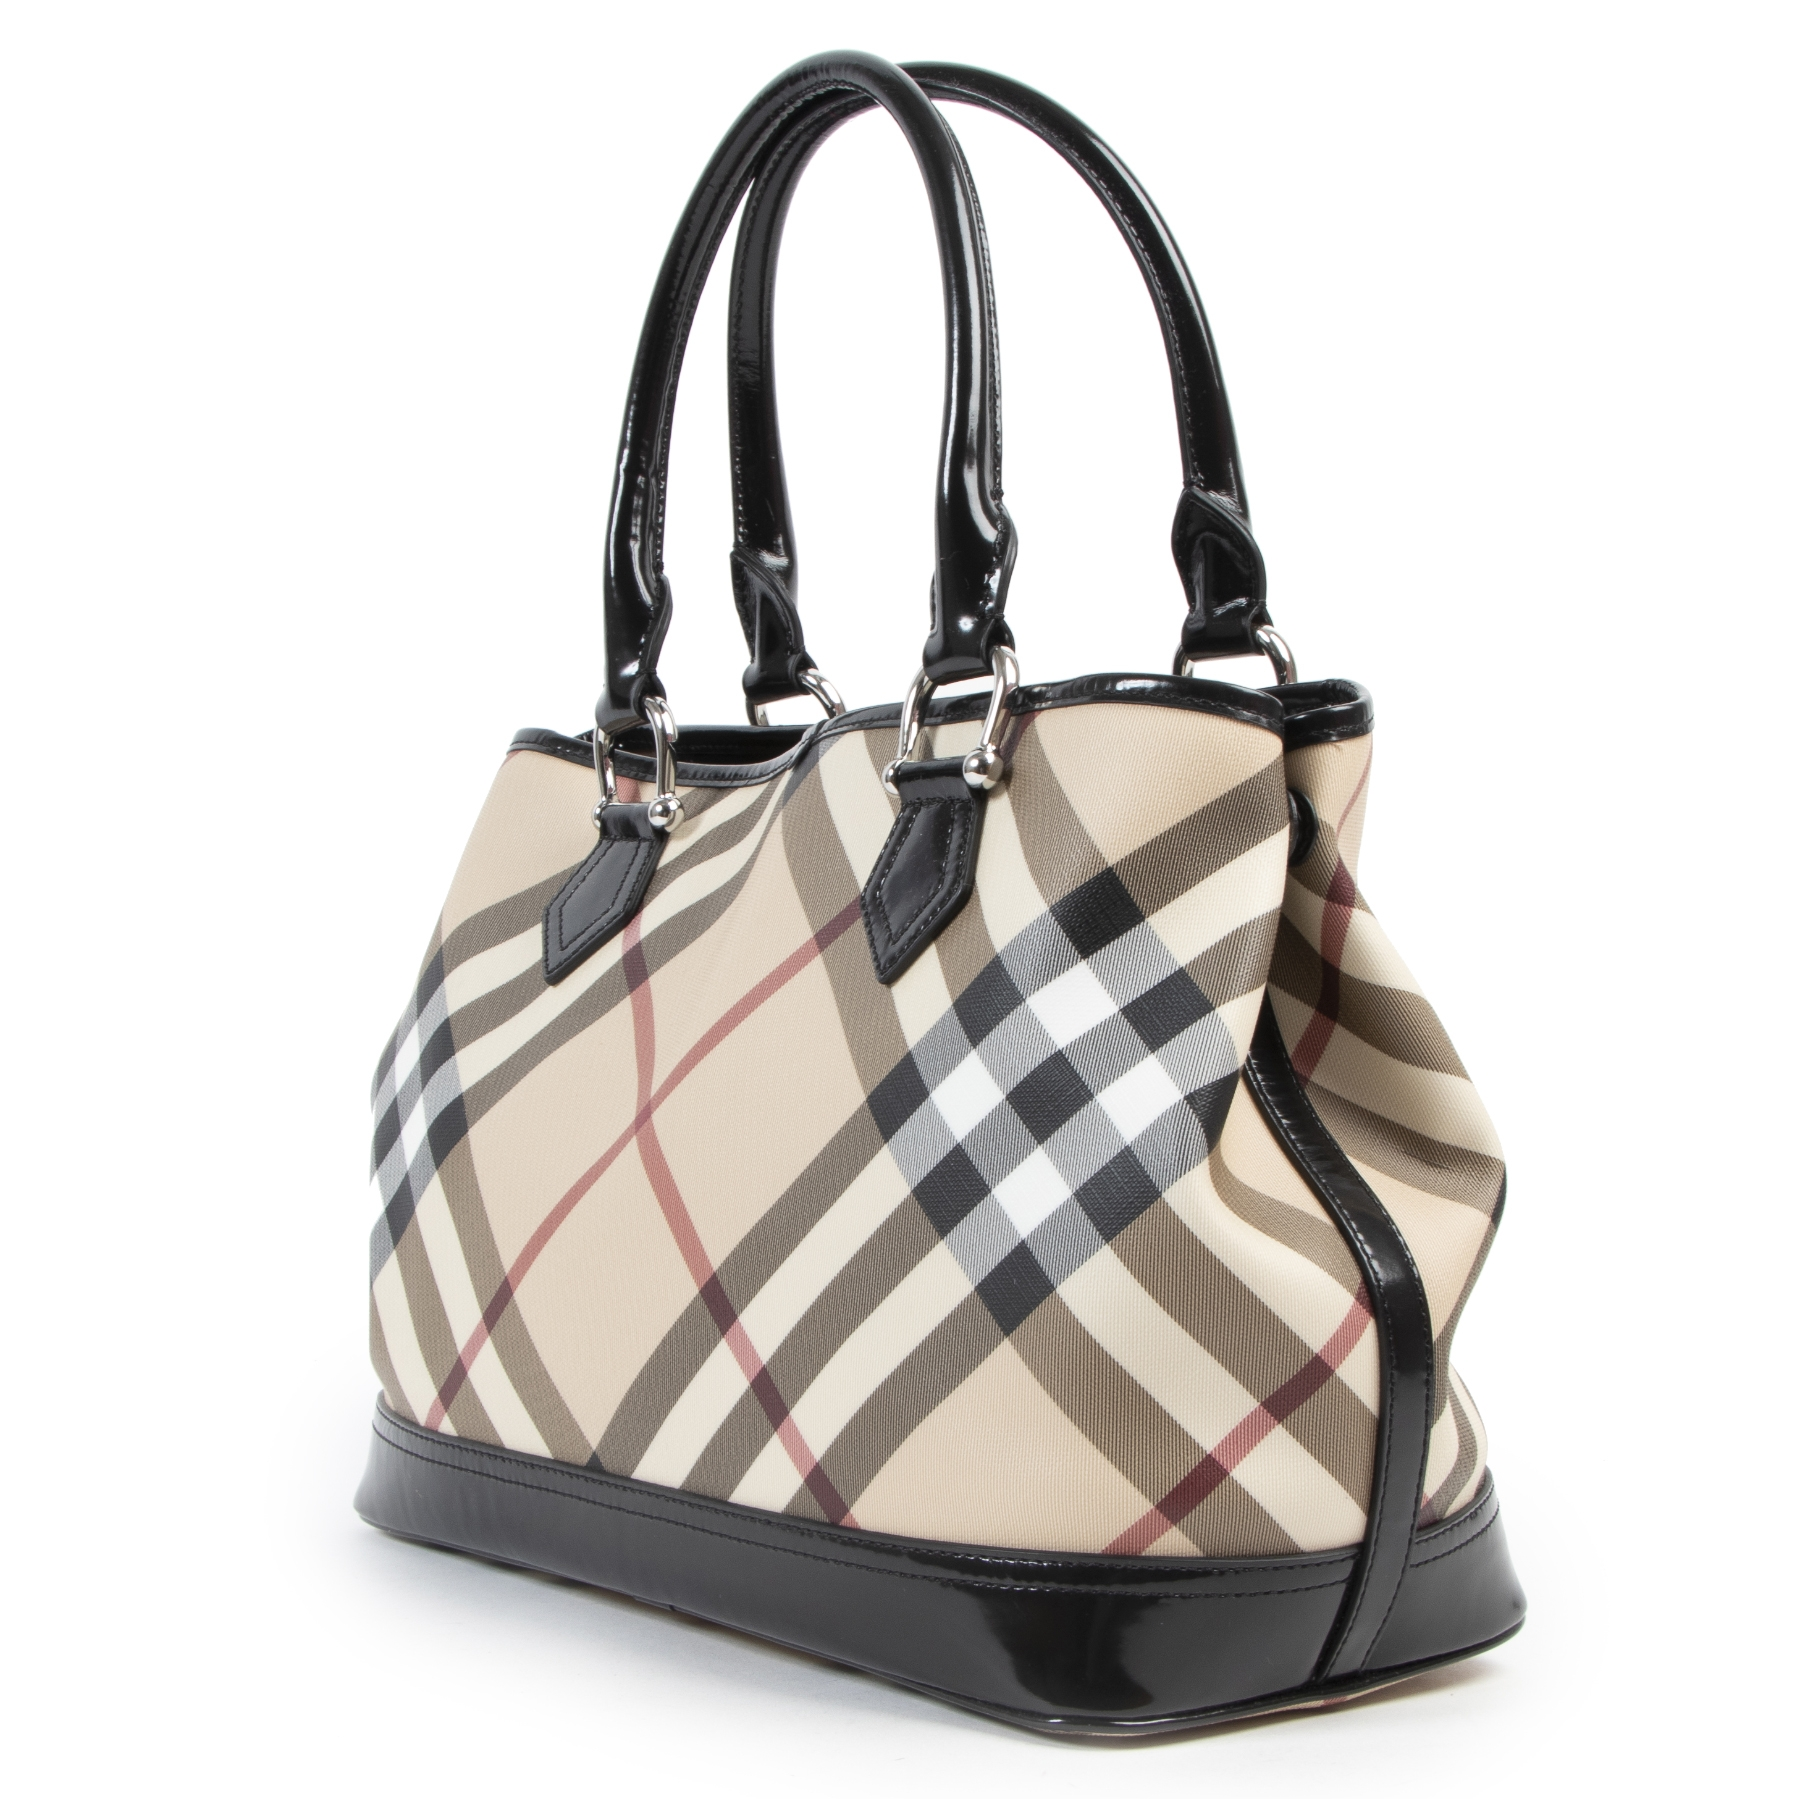 Buy preloved Burberry handbags at LabelLOV Antwerp.